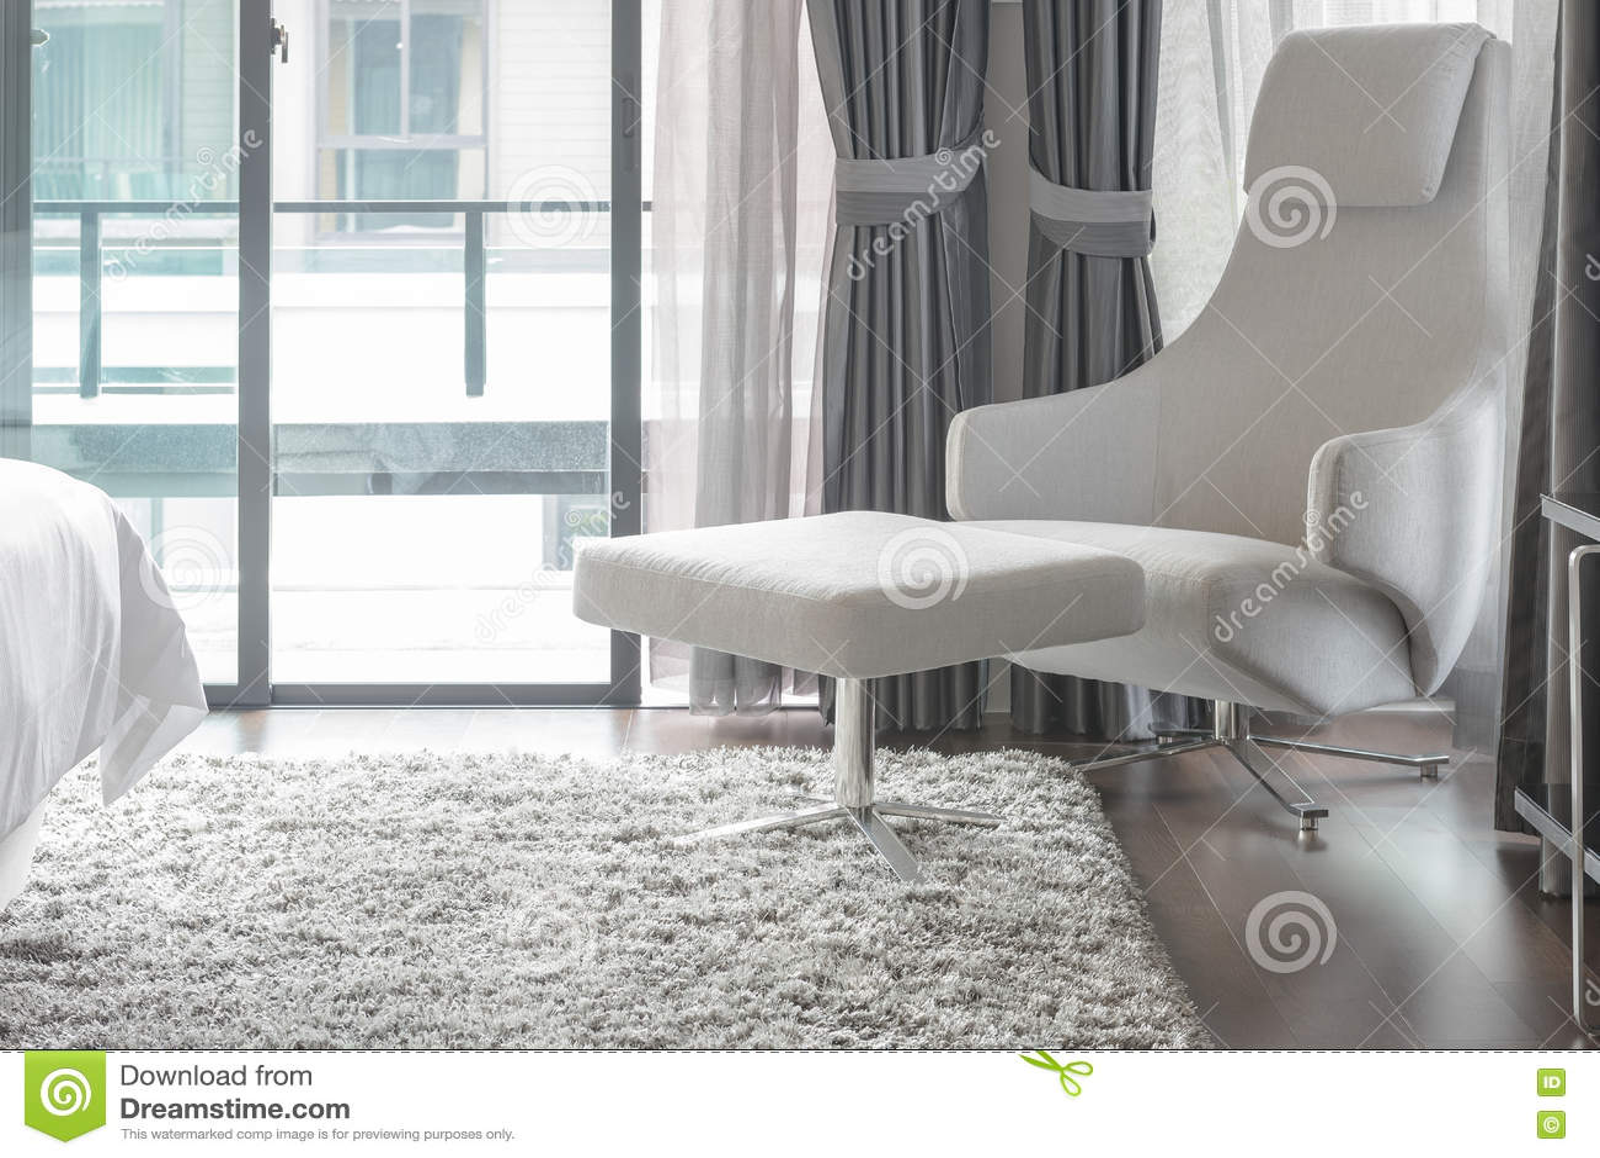 Slaapkamer Met Tapijt : Witte moderne stoel op tapijt in moderne slaapkamer stock foto